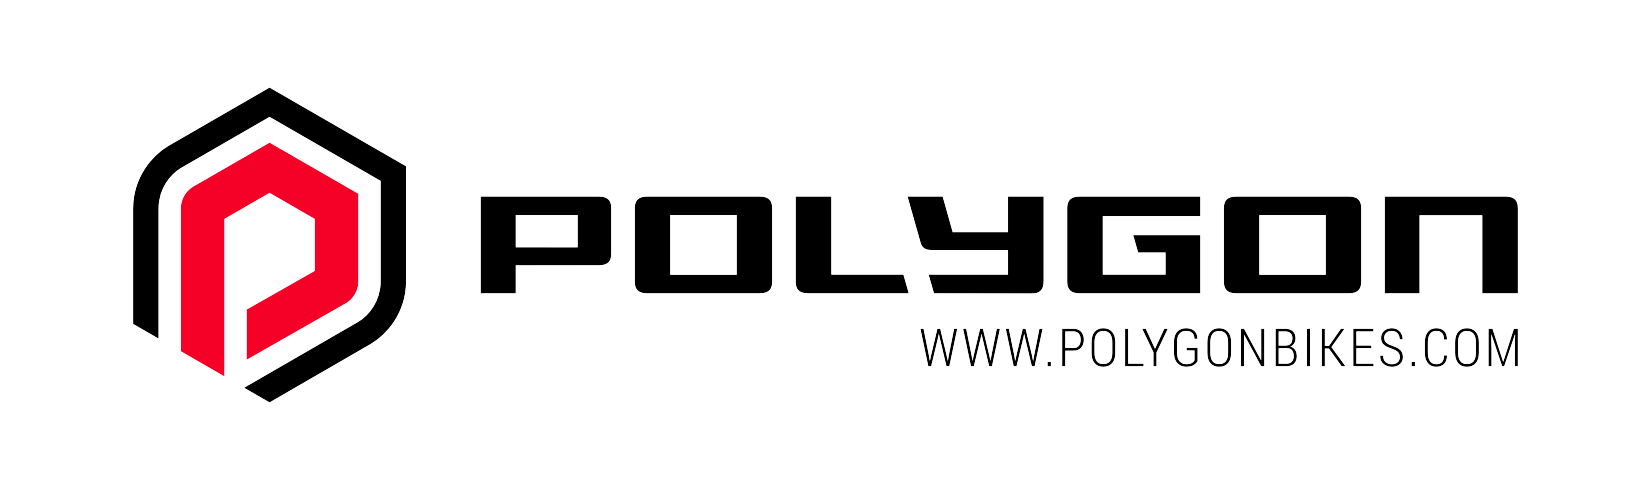 Polygon logo png 4 » PNG Image.